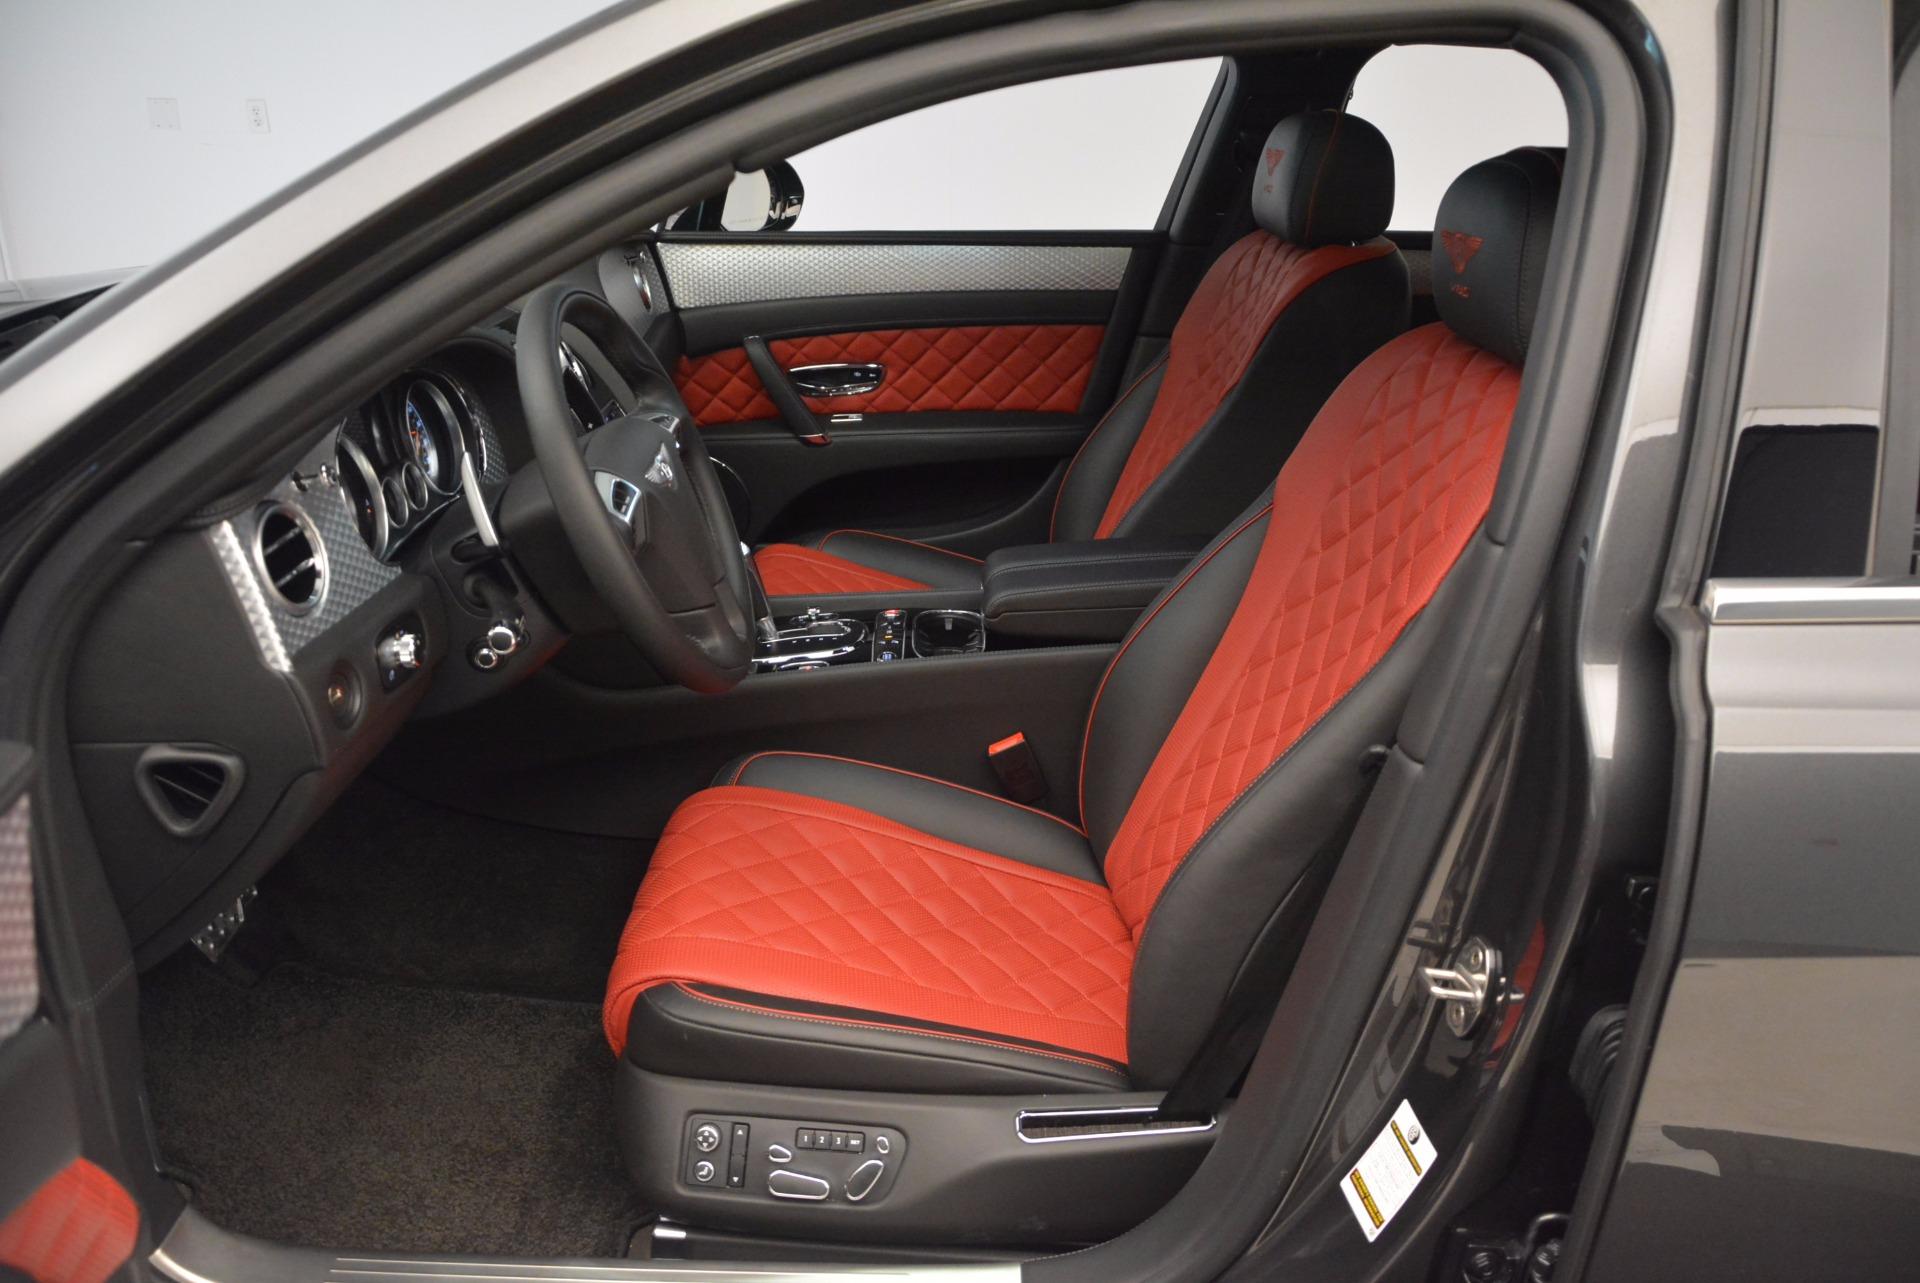 Used 2017 Bentley Flying Spur V8 S For Sale In Westport, CT 875_p25